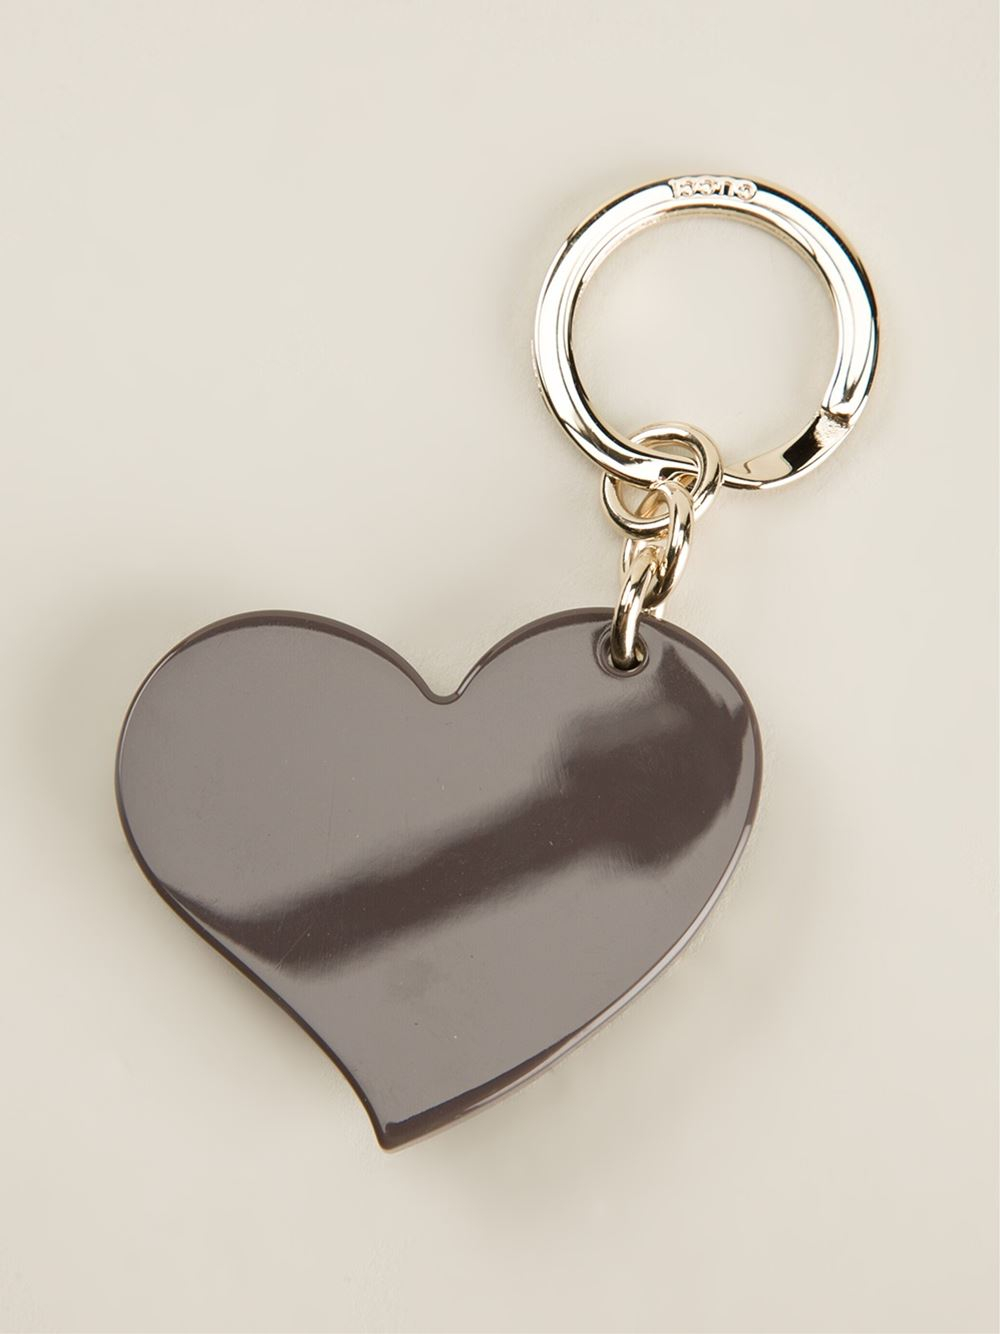 b5a42e54ef4a Lyst - Gucci Heart Shape Keyring in Gray